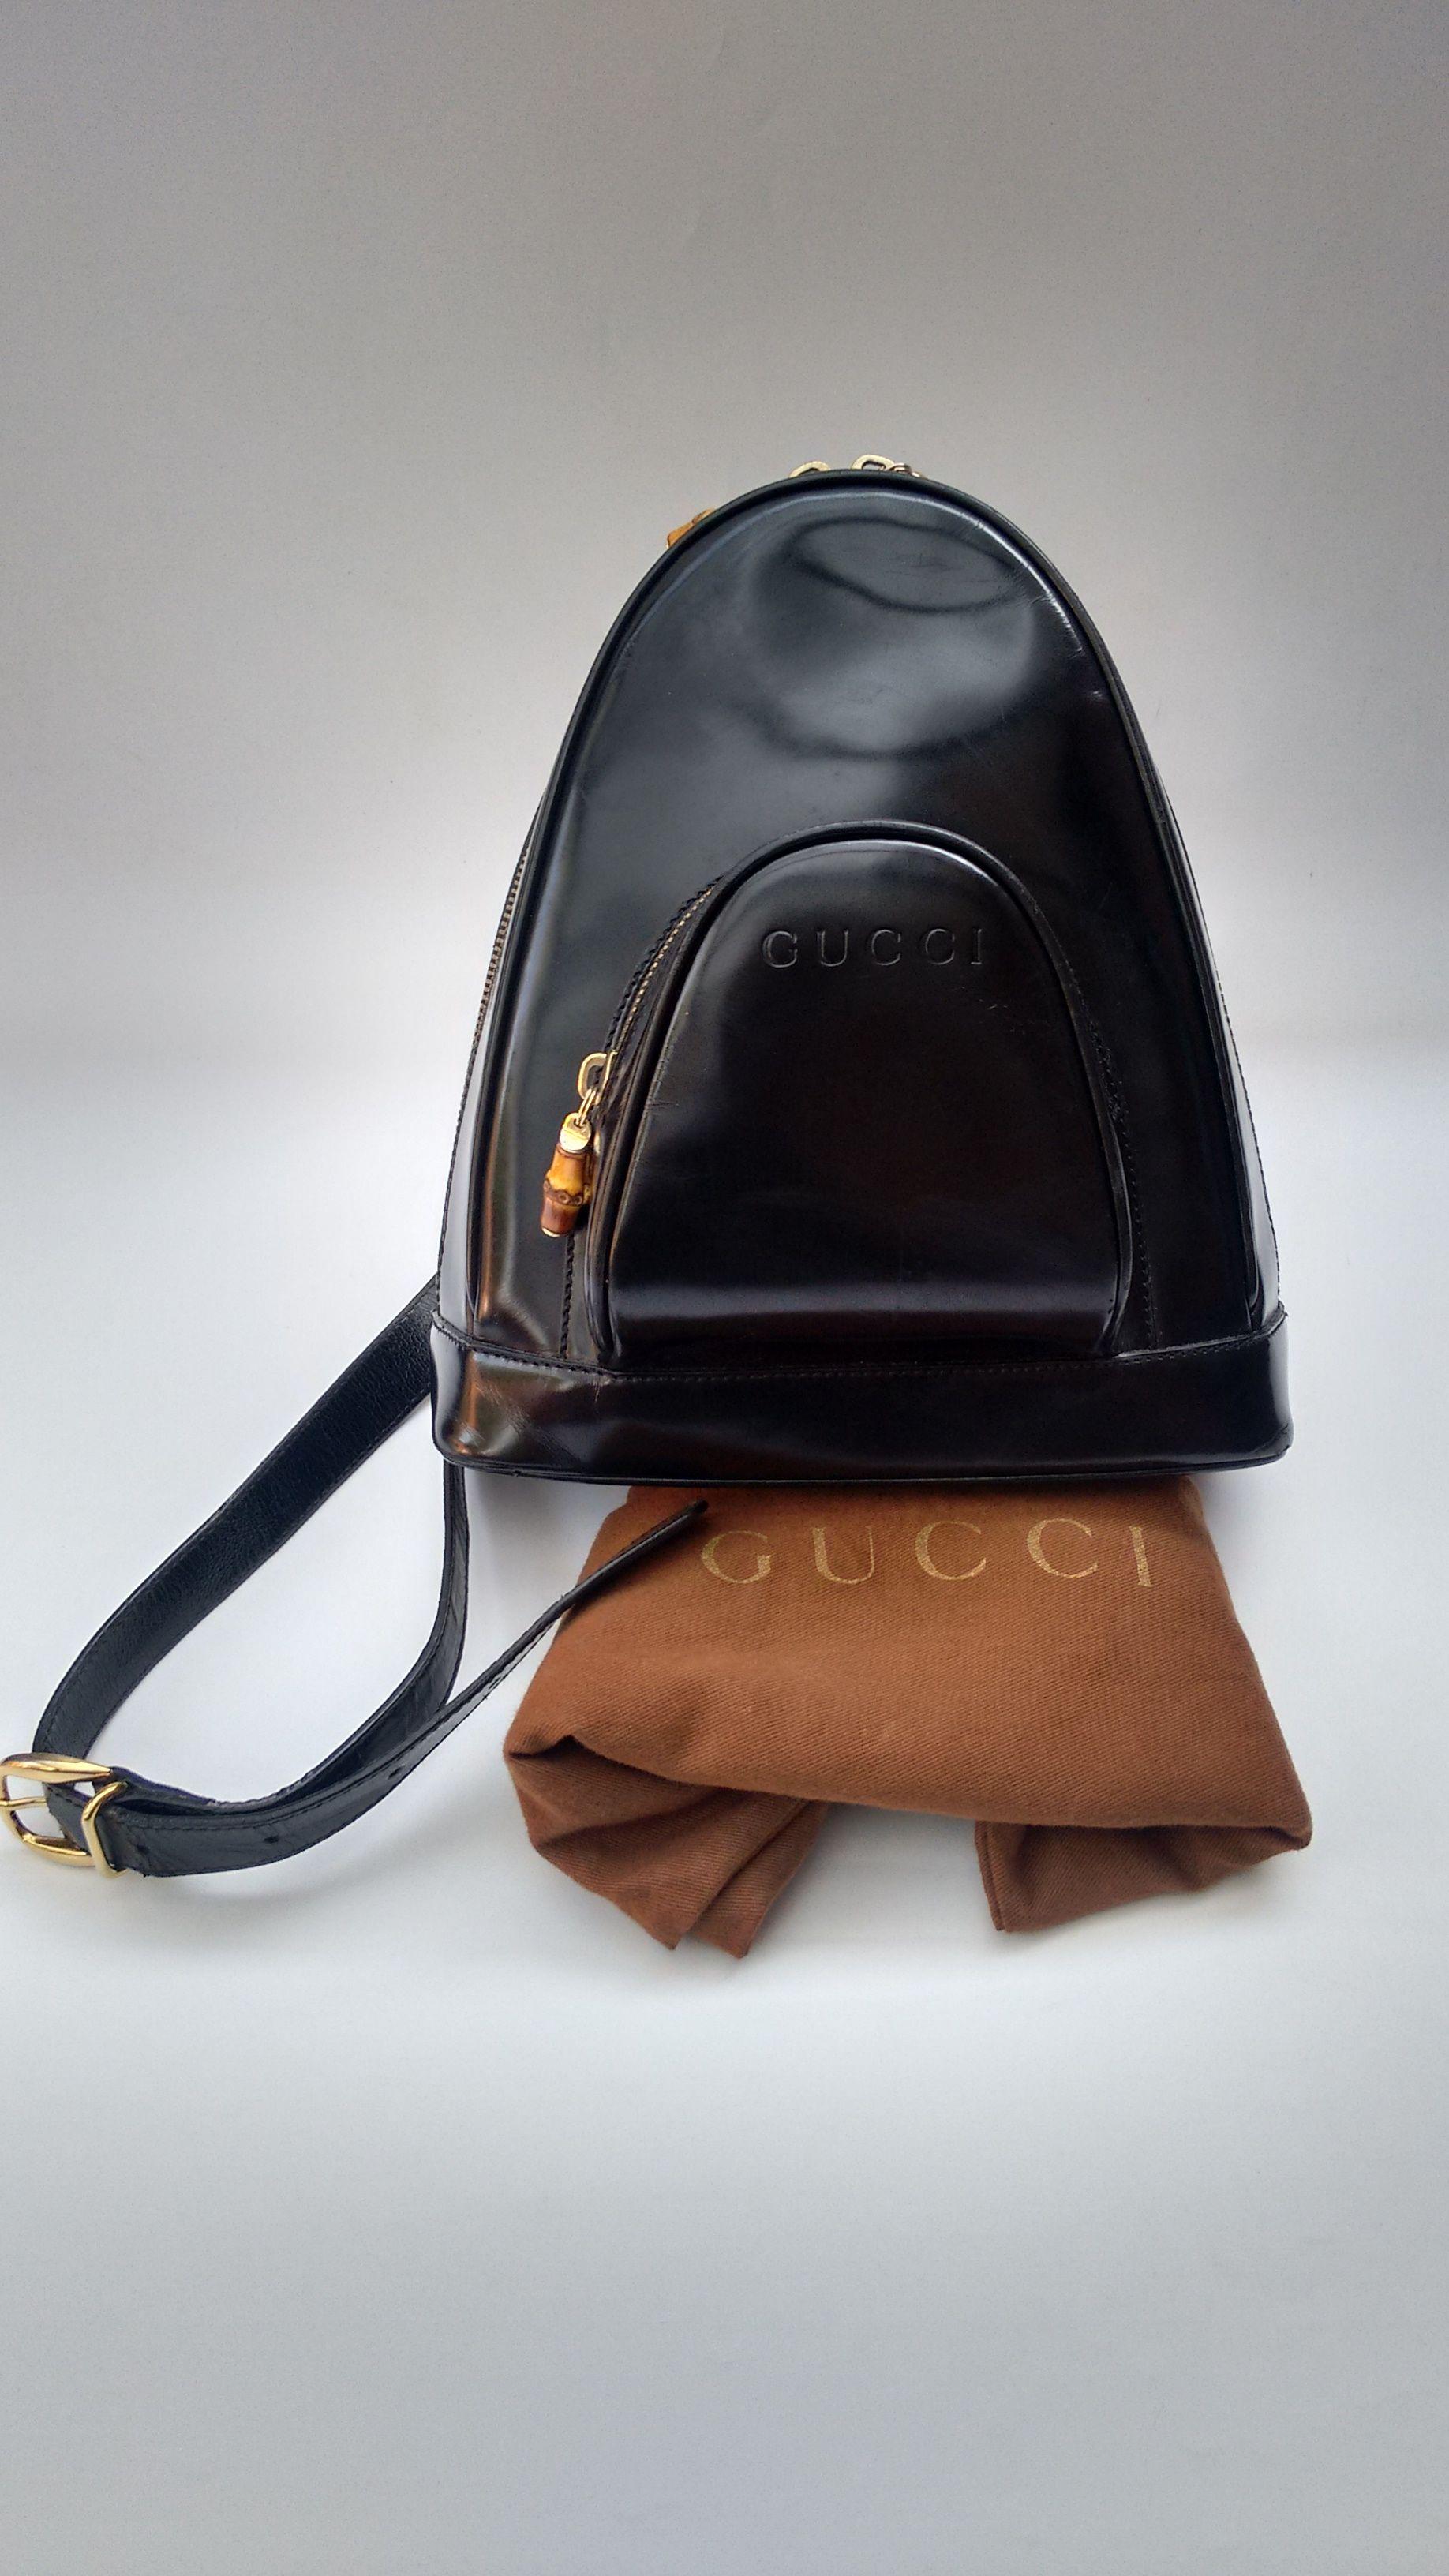 42a0a5f90f2a3d GUCCI Bamboo Vintage Black Leather Backpack / Shoulder Bag. Italian designer  purse. Tom Ford Era.